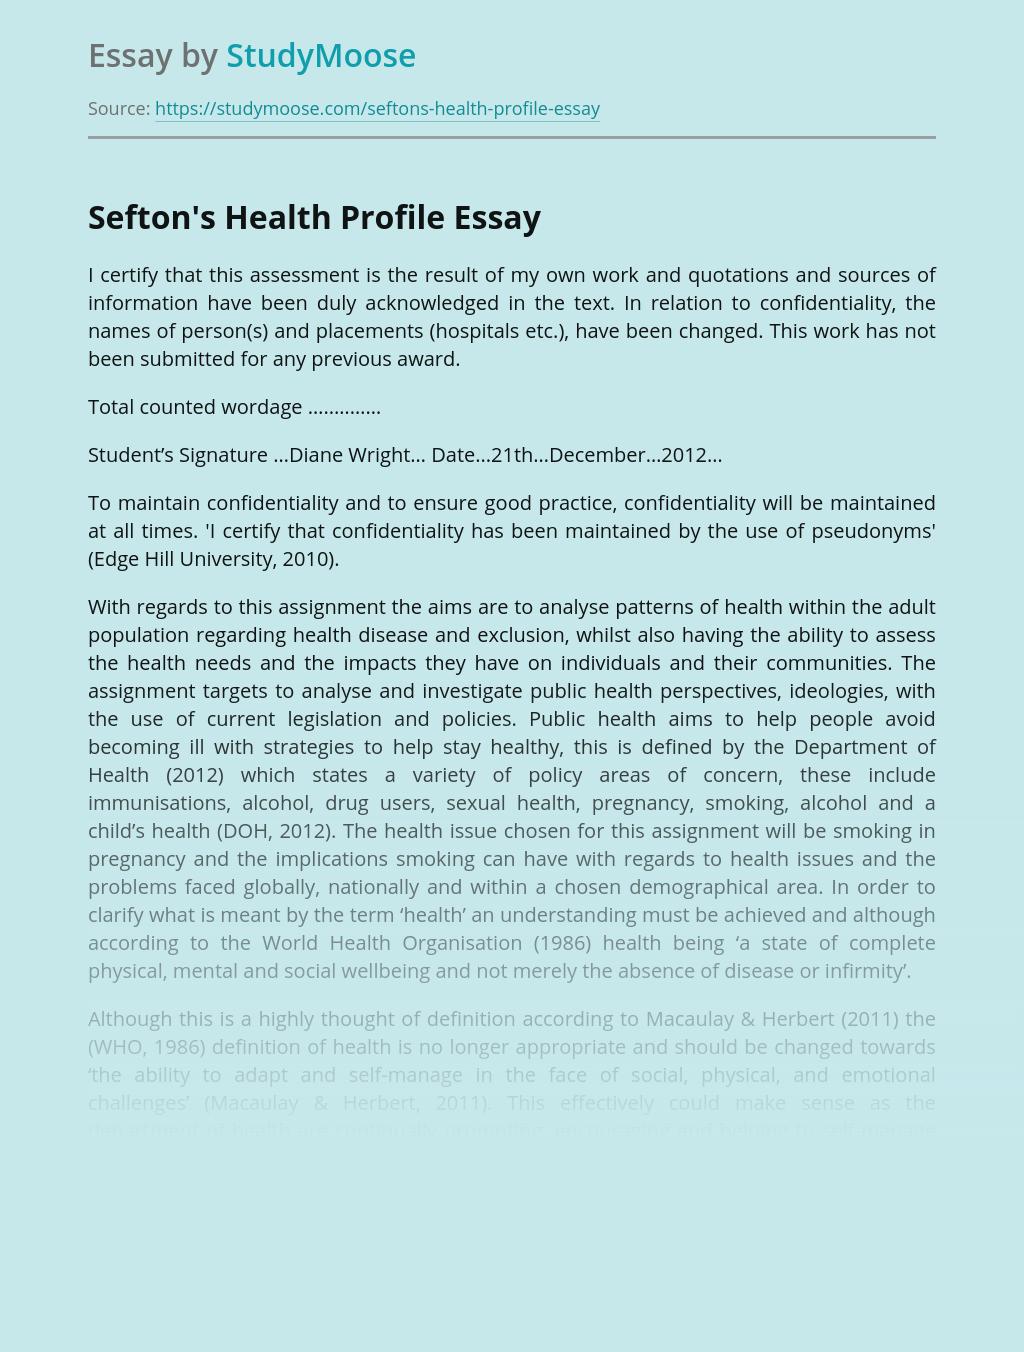 Sefton's Health Profile